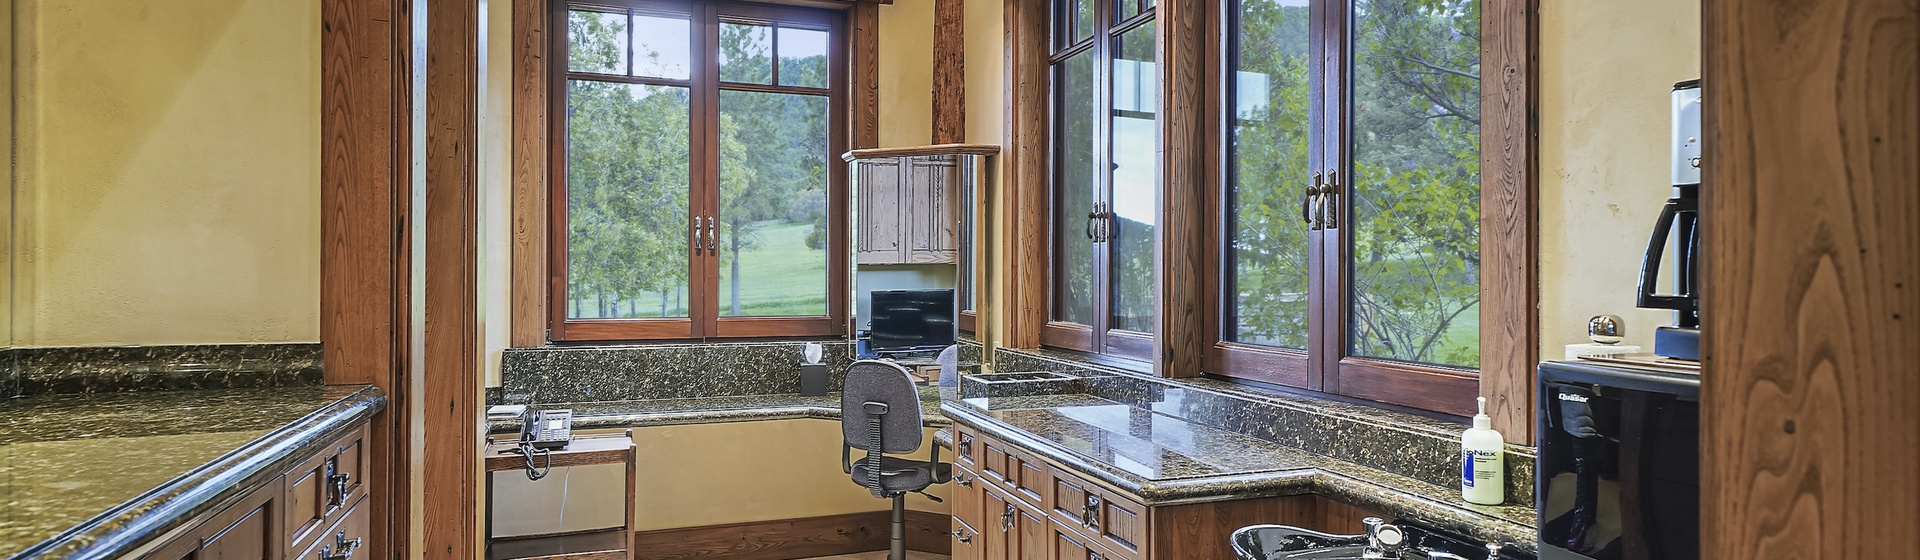 5.4-Telluride-Sleeping-Indian-Ranch-master-bedroom-A-dressing-room-2-web.JPG